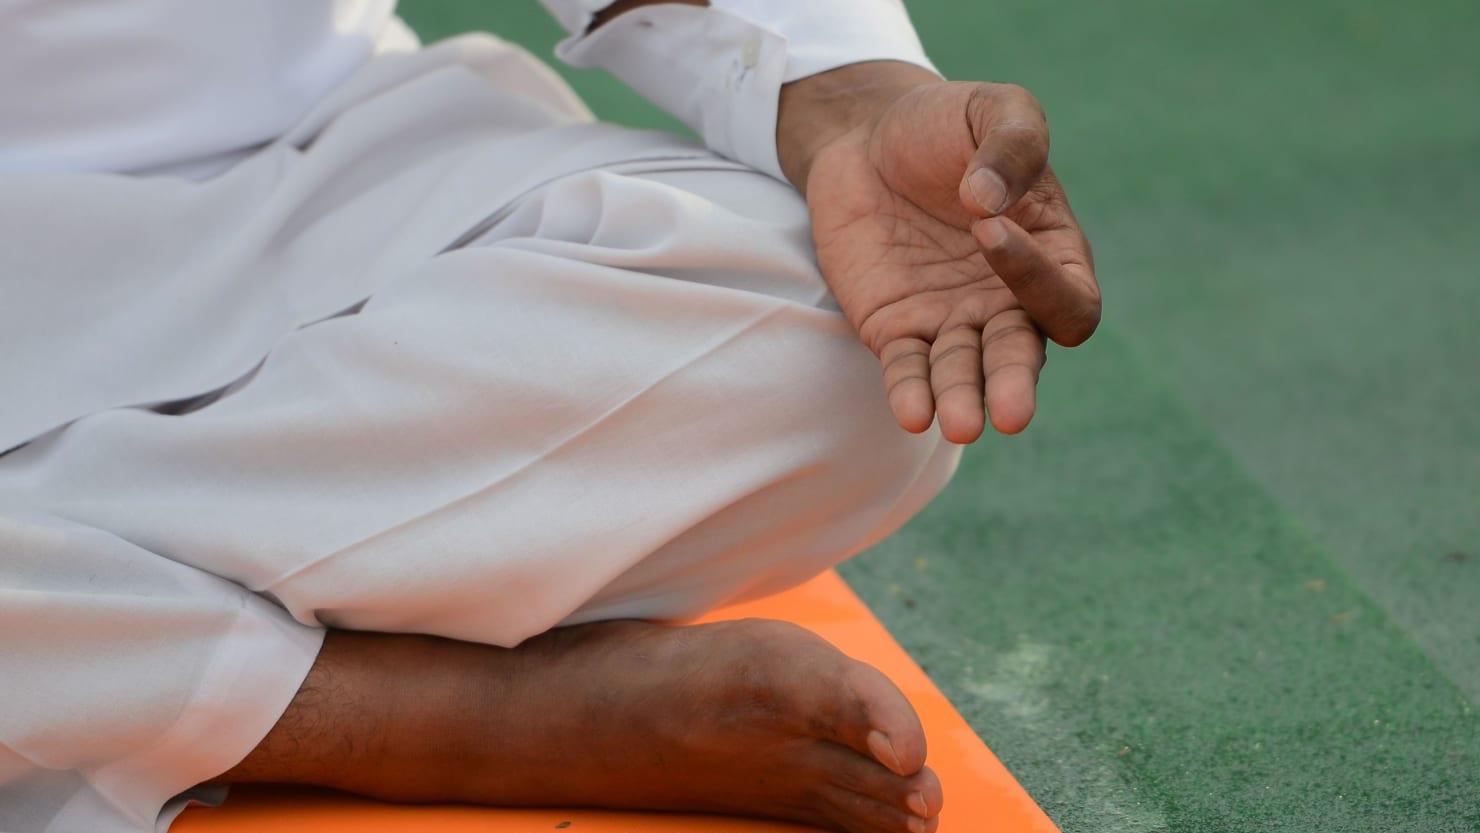 Yoga Guru Krishna Pattabhi Jois Accused of Sexual Assault: Report